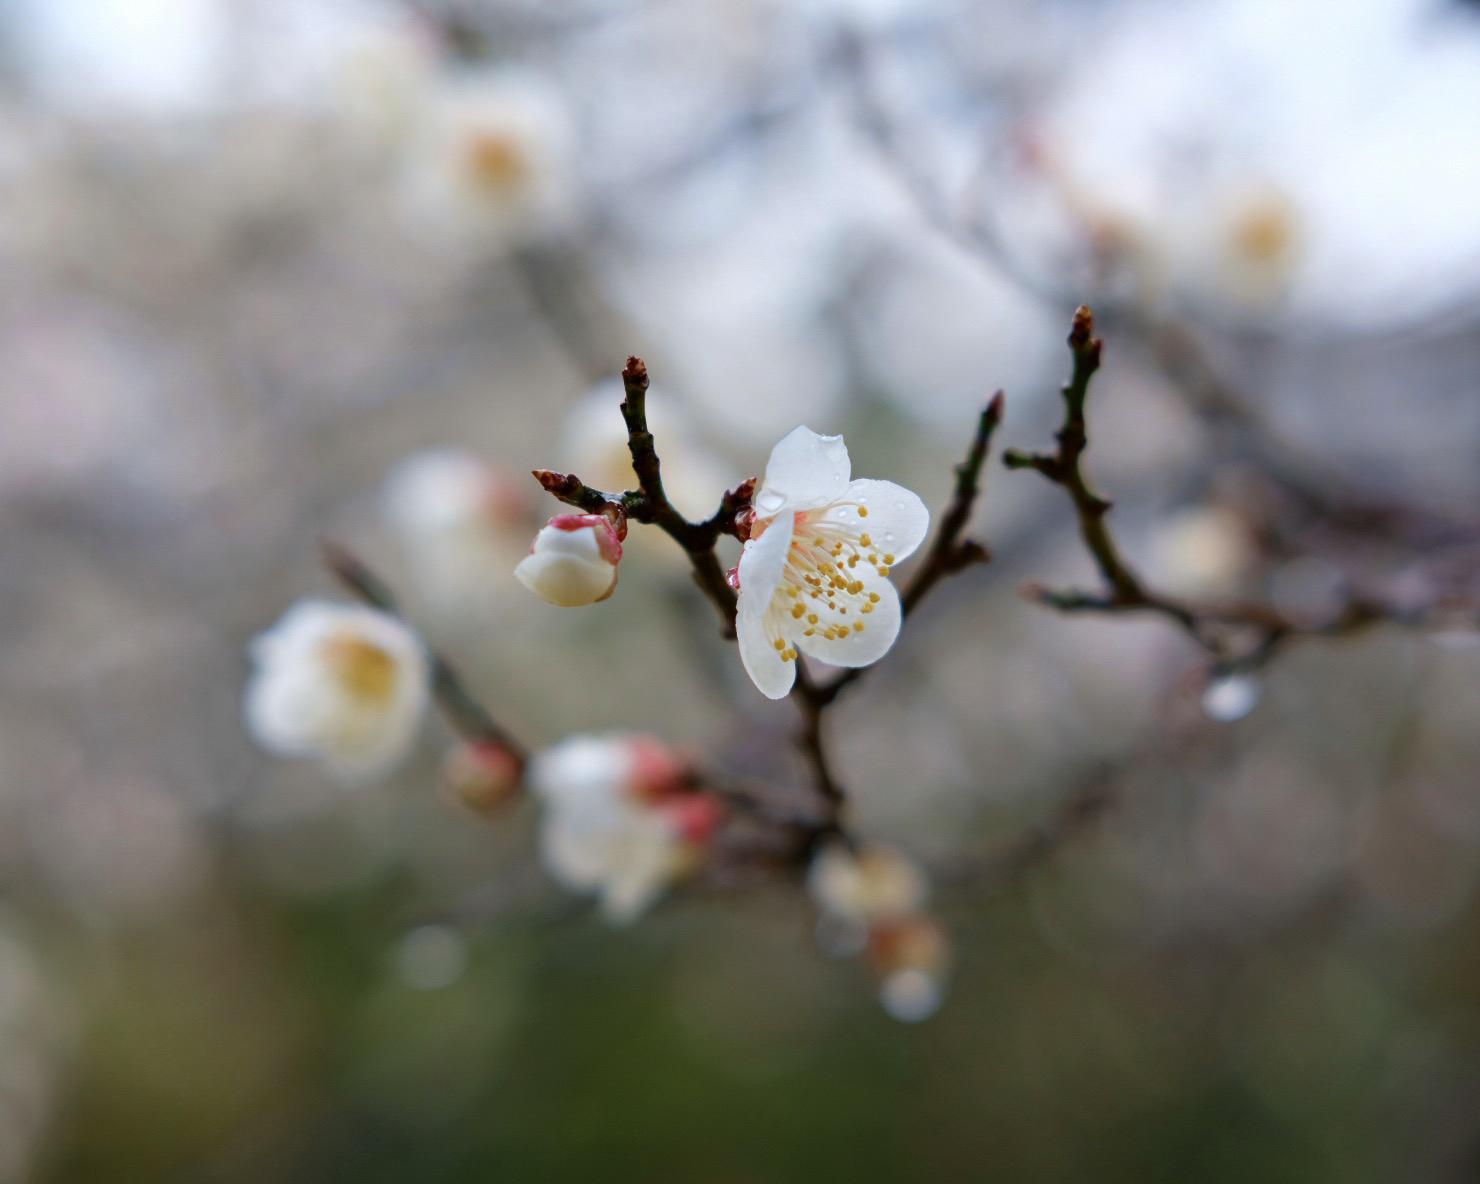 Macro shot of cherry blossoms in full bloom.